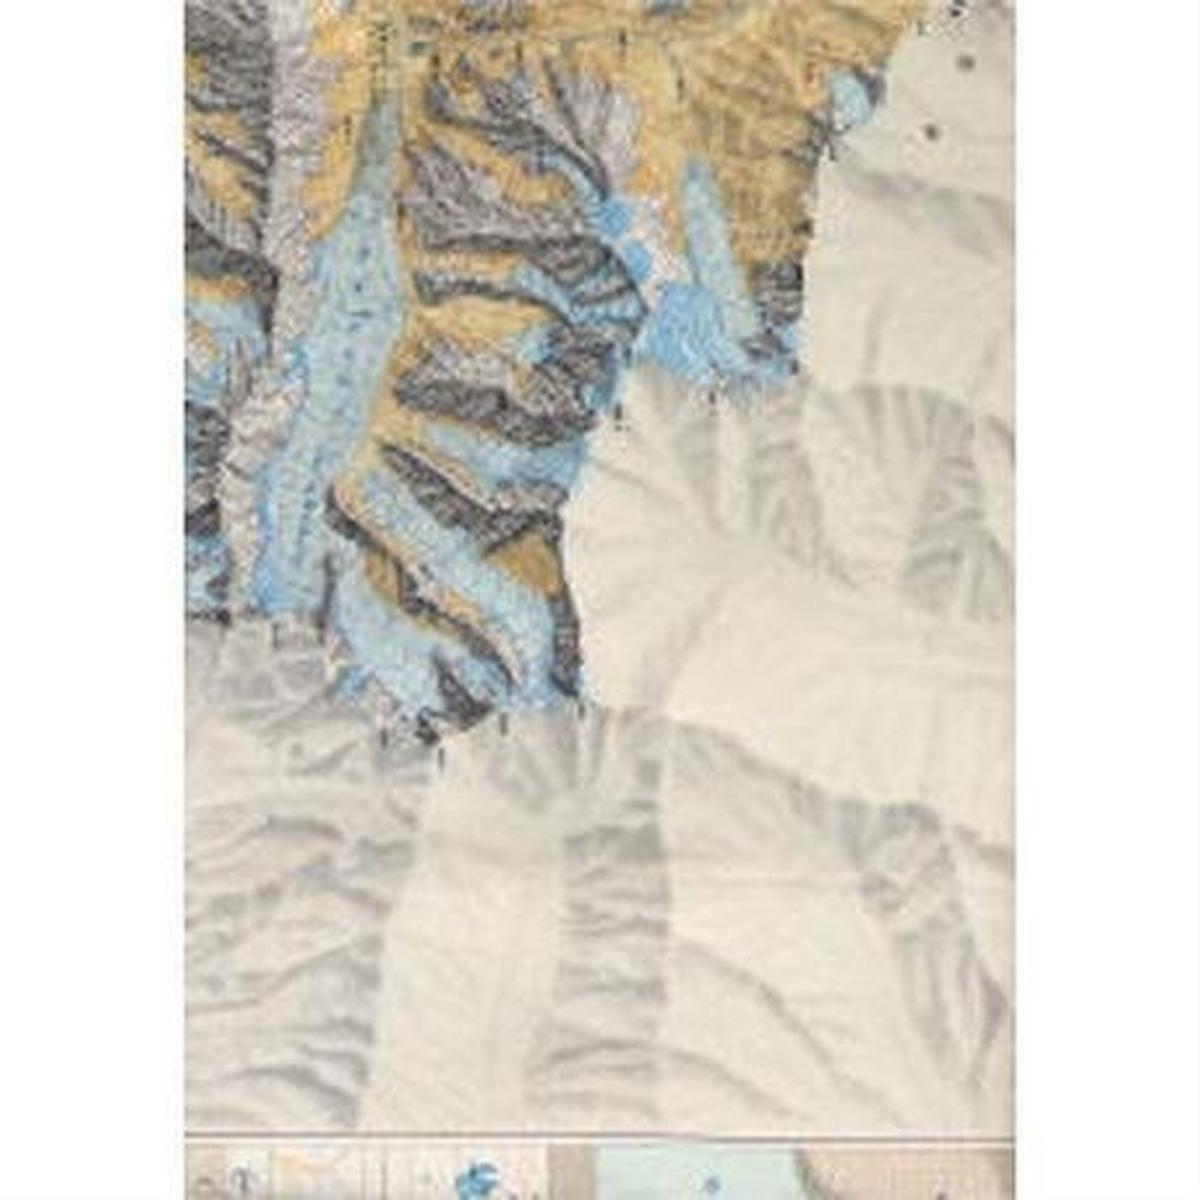 Miscellaneous Pakistan Map: Batura Glacier, Karakoram, Pakistan 1:60,000